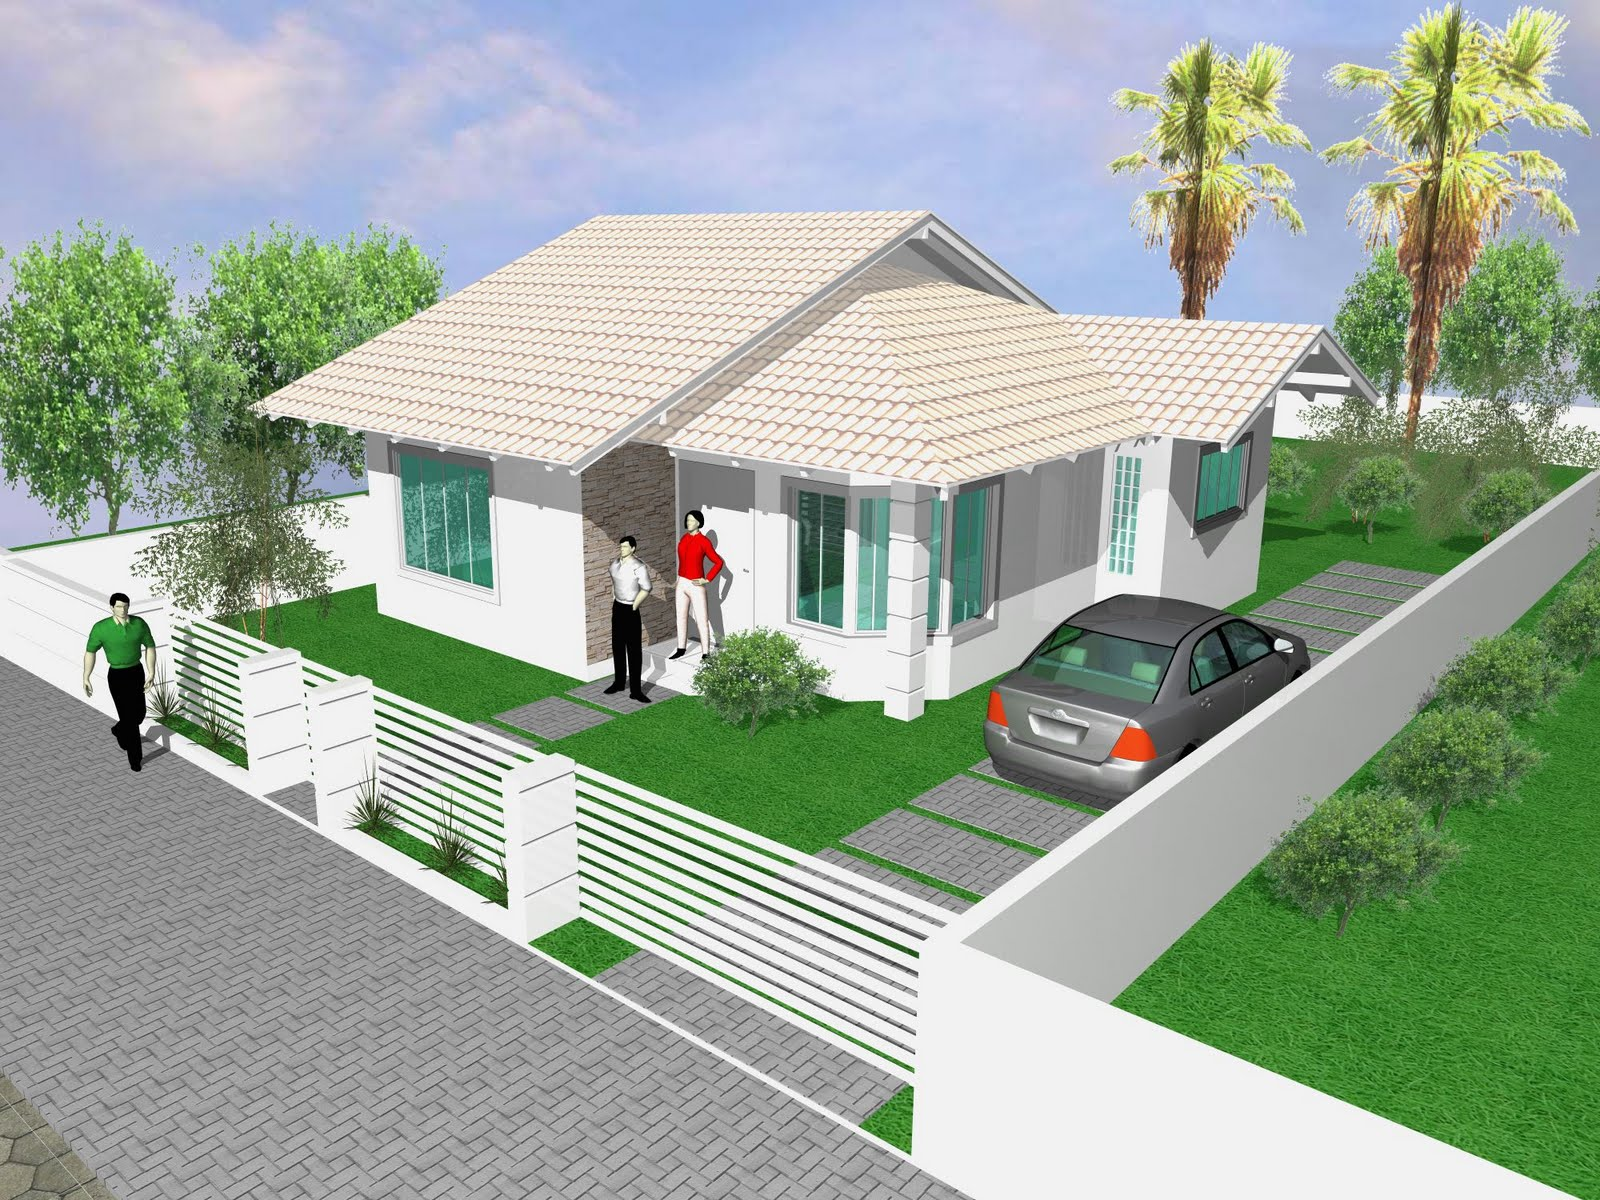 Meu Projeto Pronto: Casa 70 00m² #385893 1600 1200